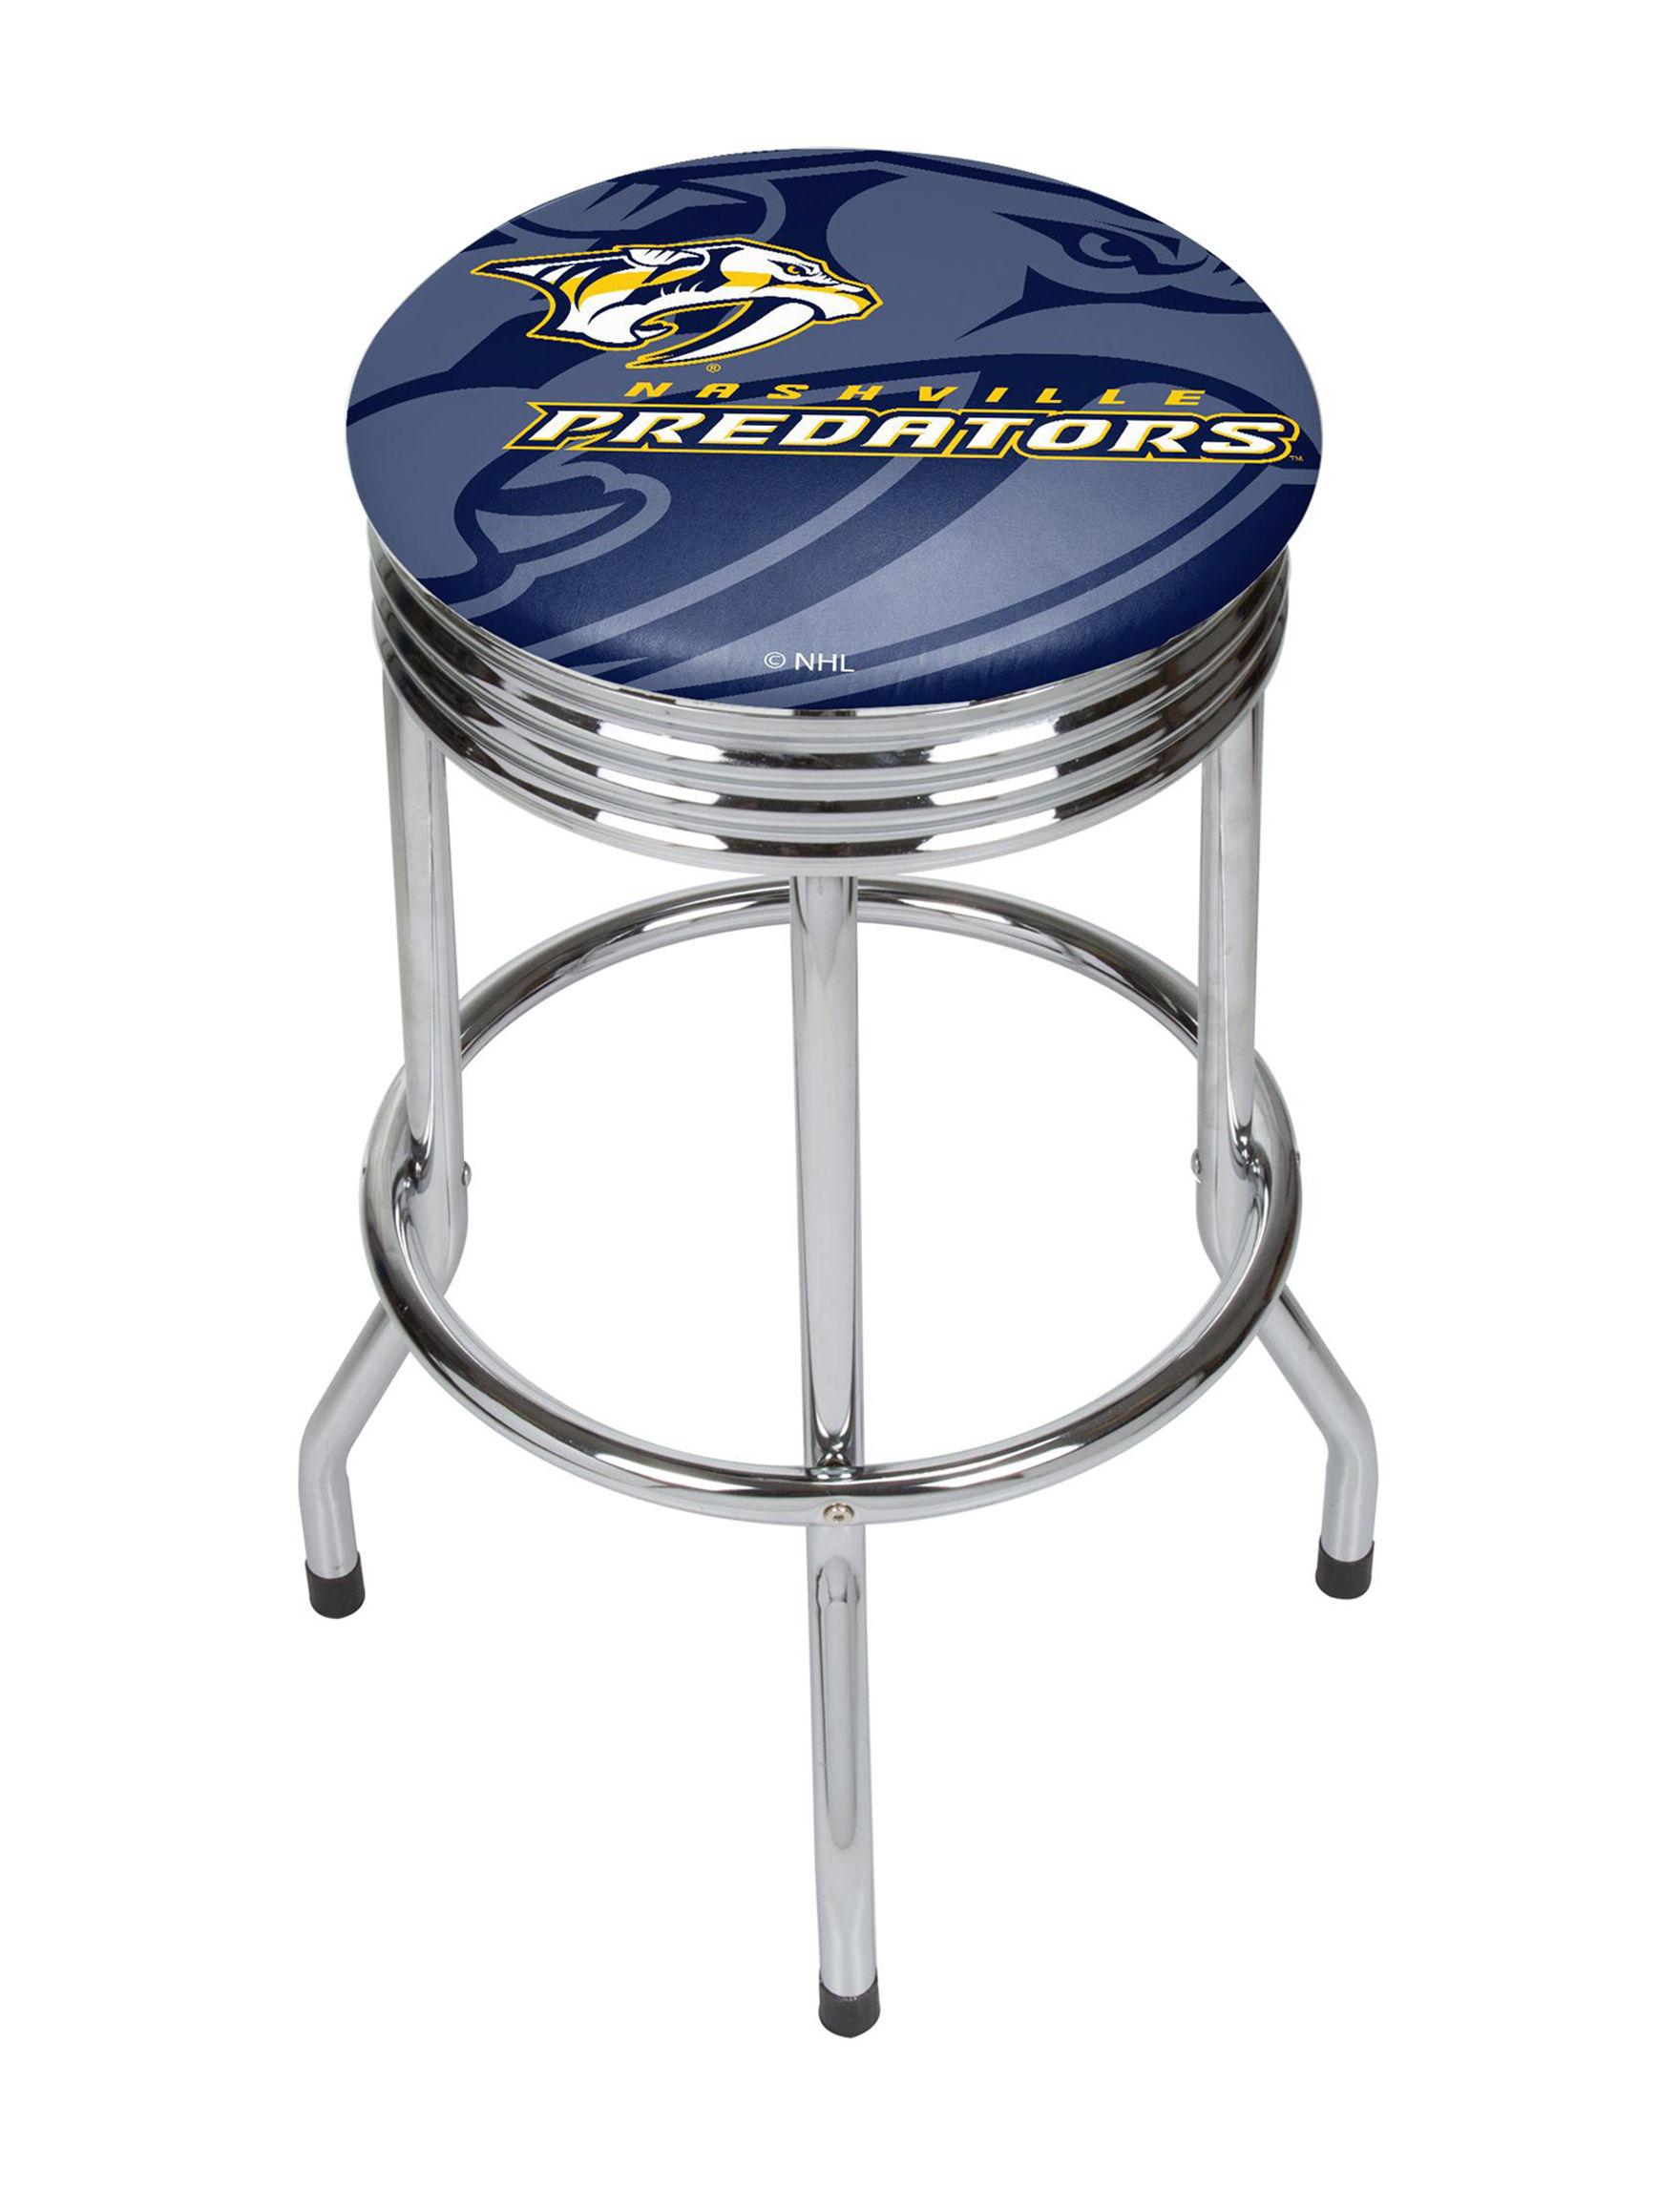 NHL Navy / Yellow Bar & Kitchen Stools Kitchen & Dining Furniture NHL